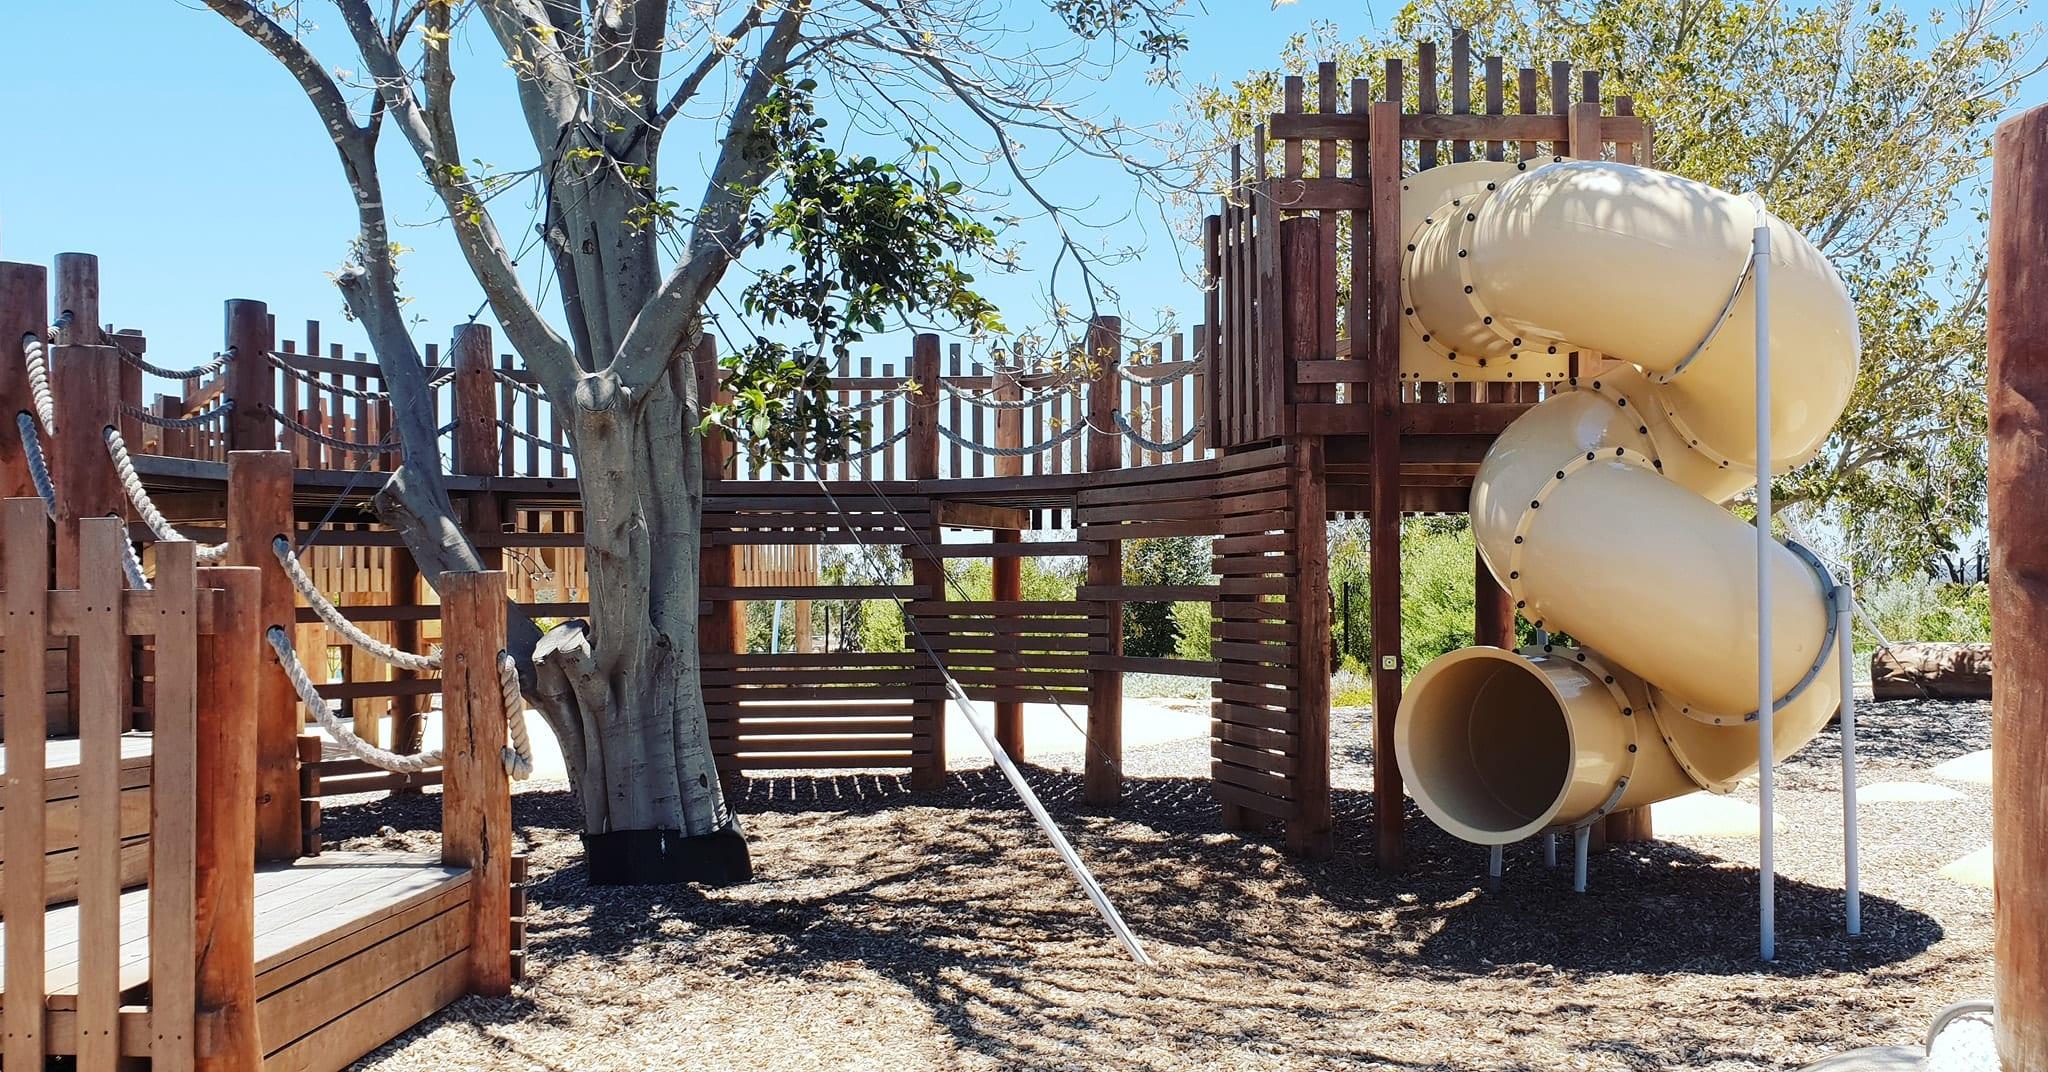 Kinkuna Adventure Playground, Eglinton